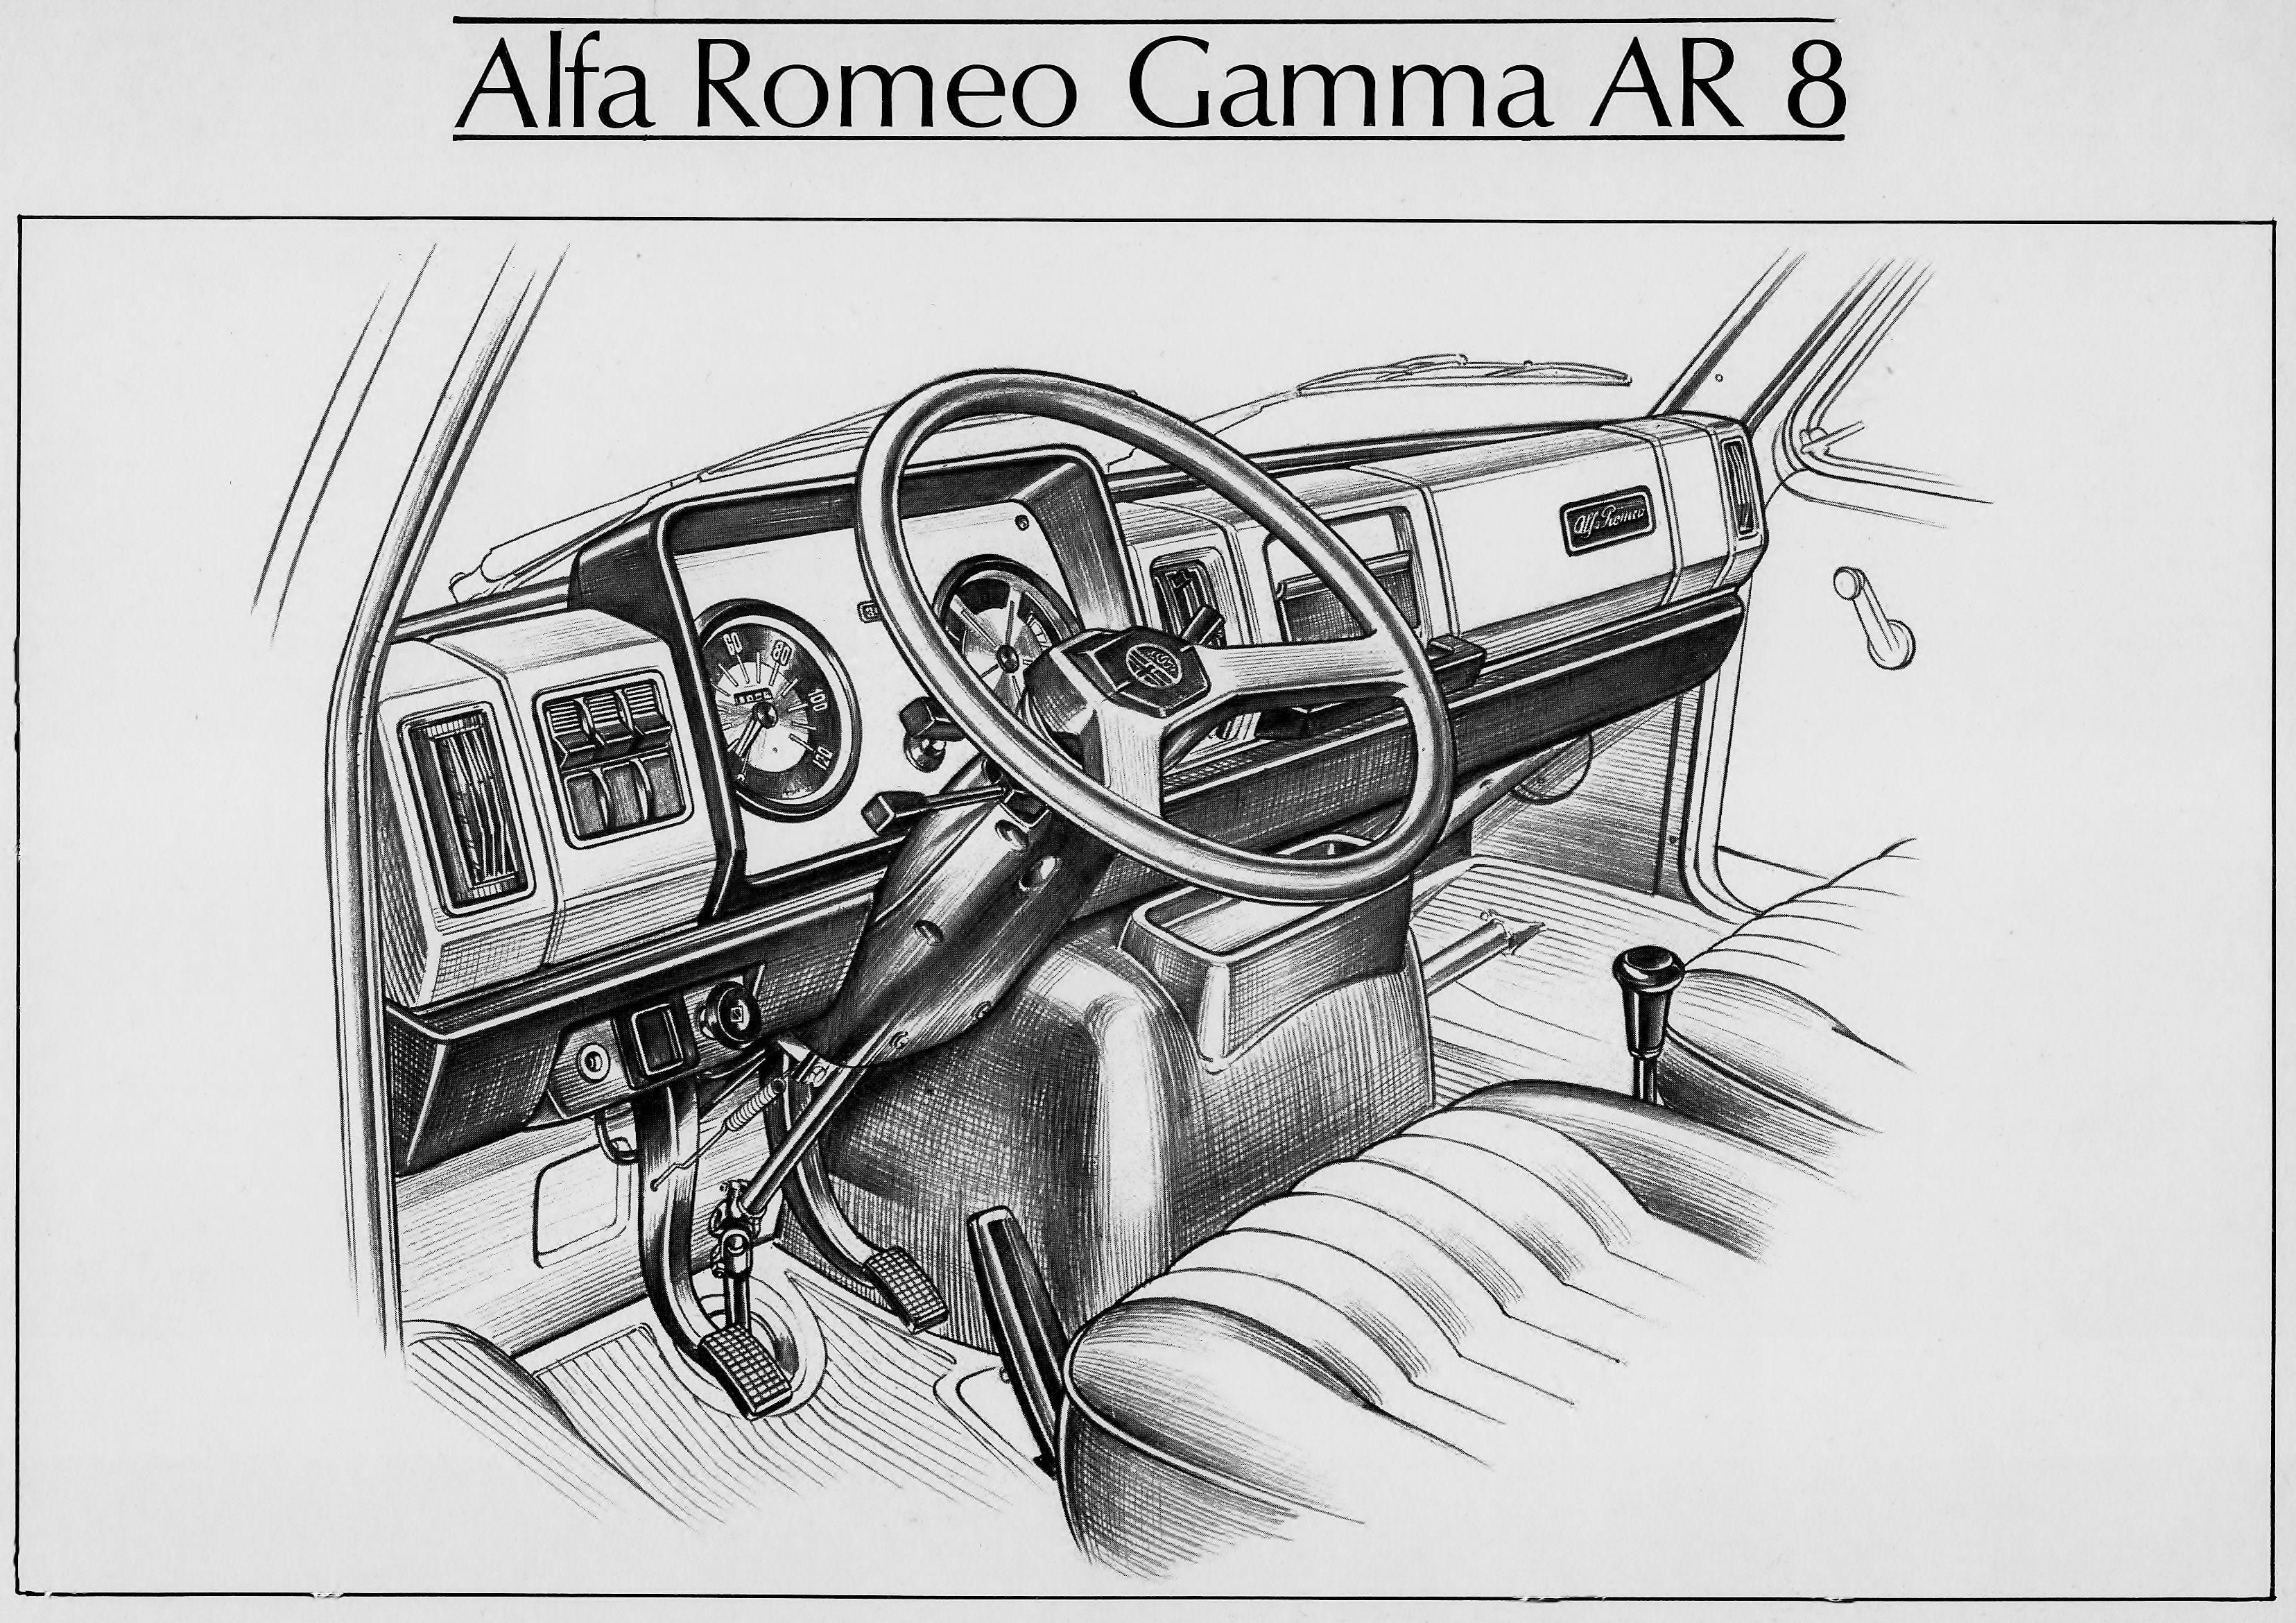 ar8 interior